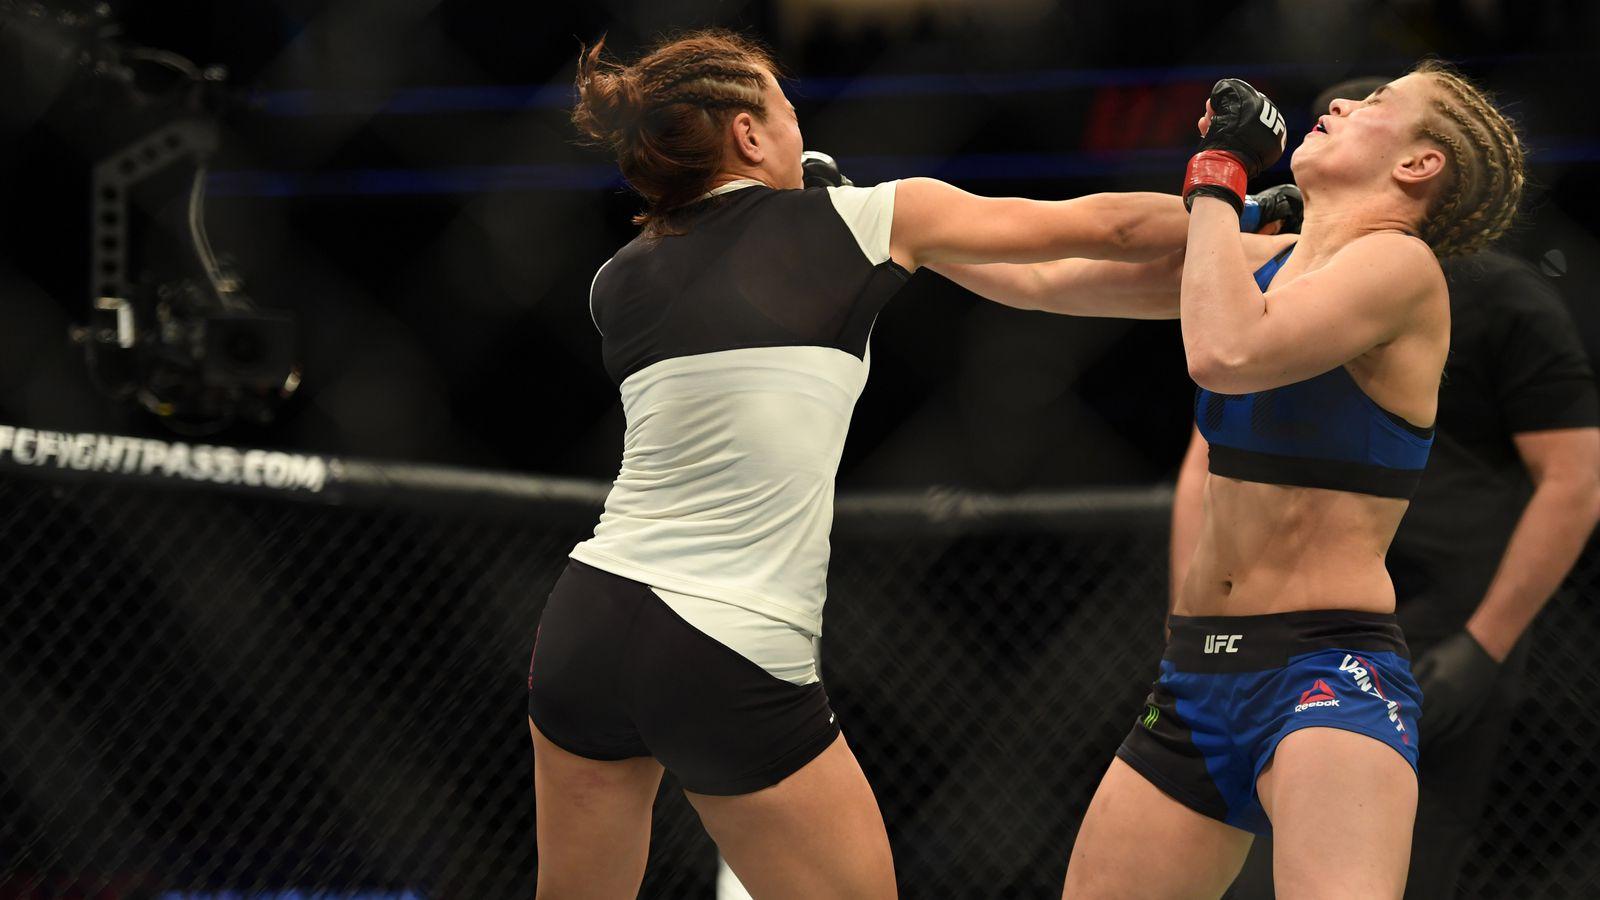 UFC Fight Night Sacremento results: Michelle Waterson